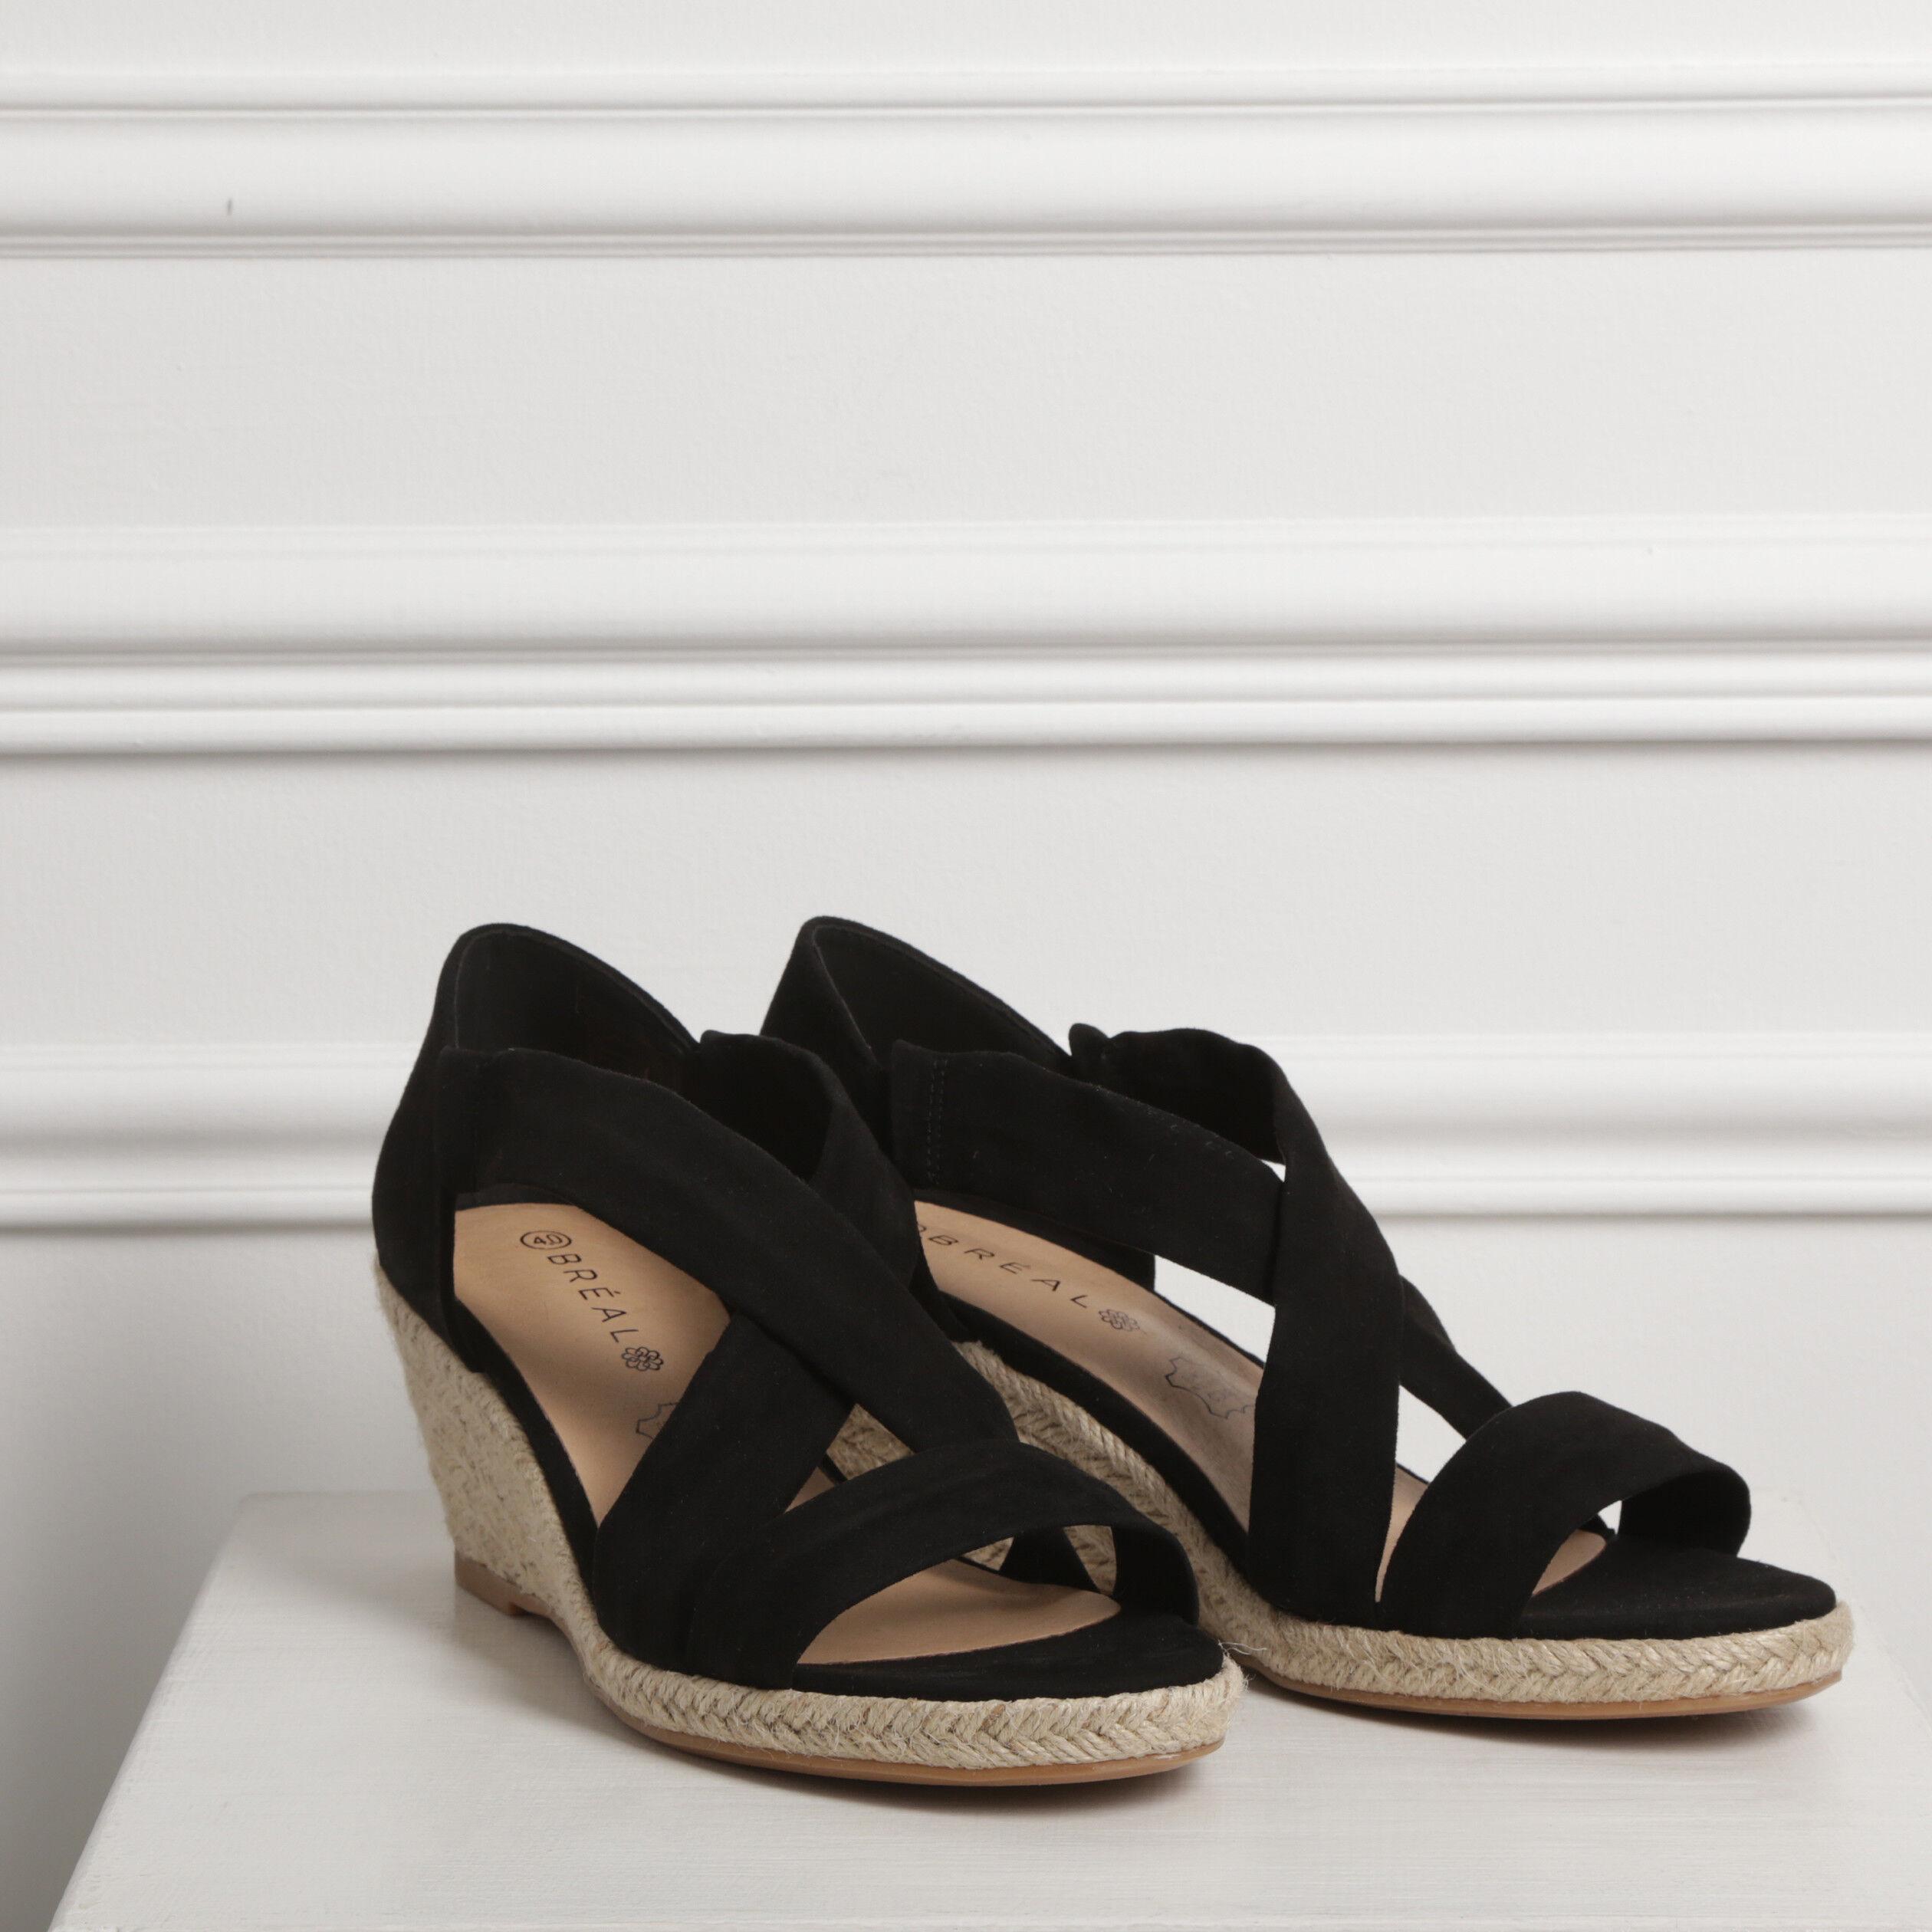 Noires Basses Sandales Sandales Basses Noires Basses Sandales Basses Noires Sandales D9WIEH2Y